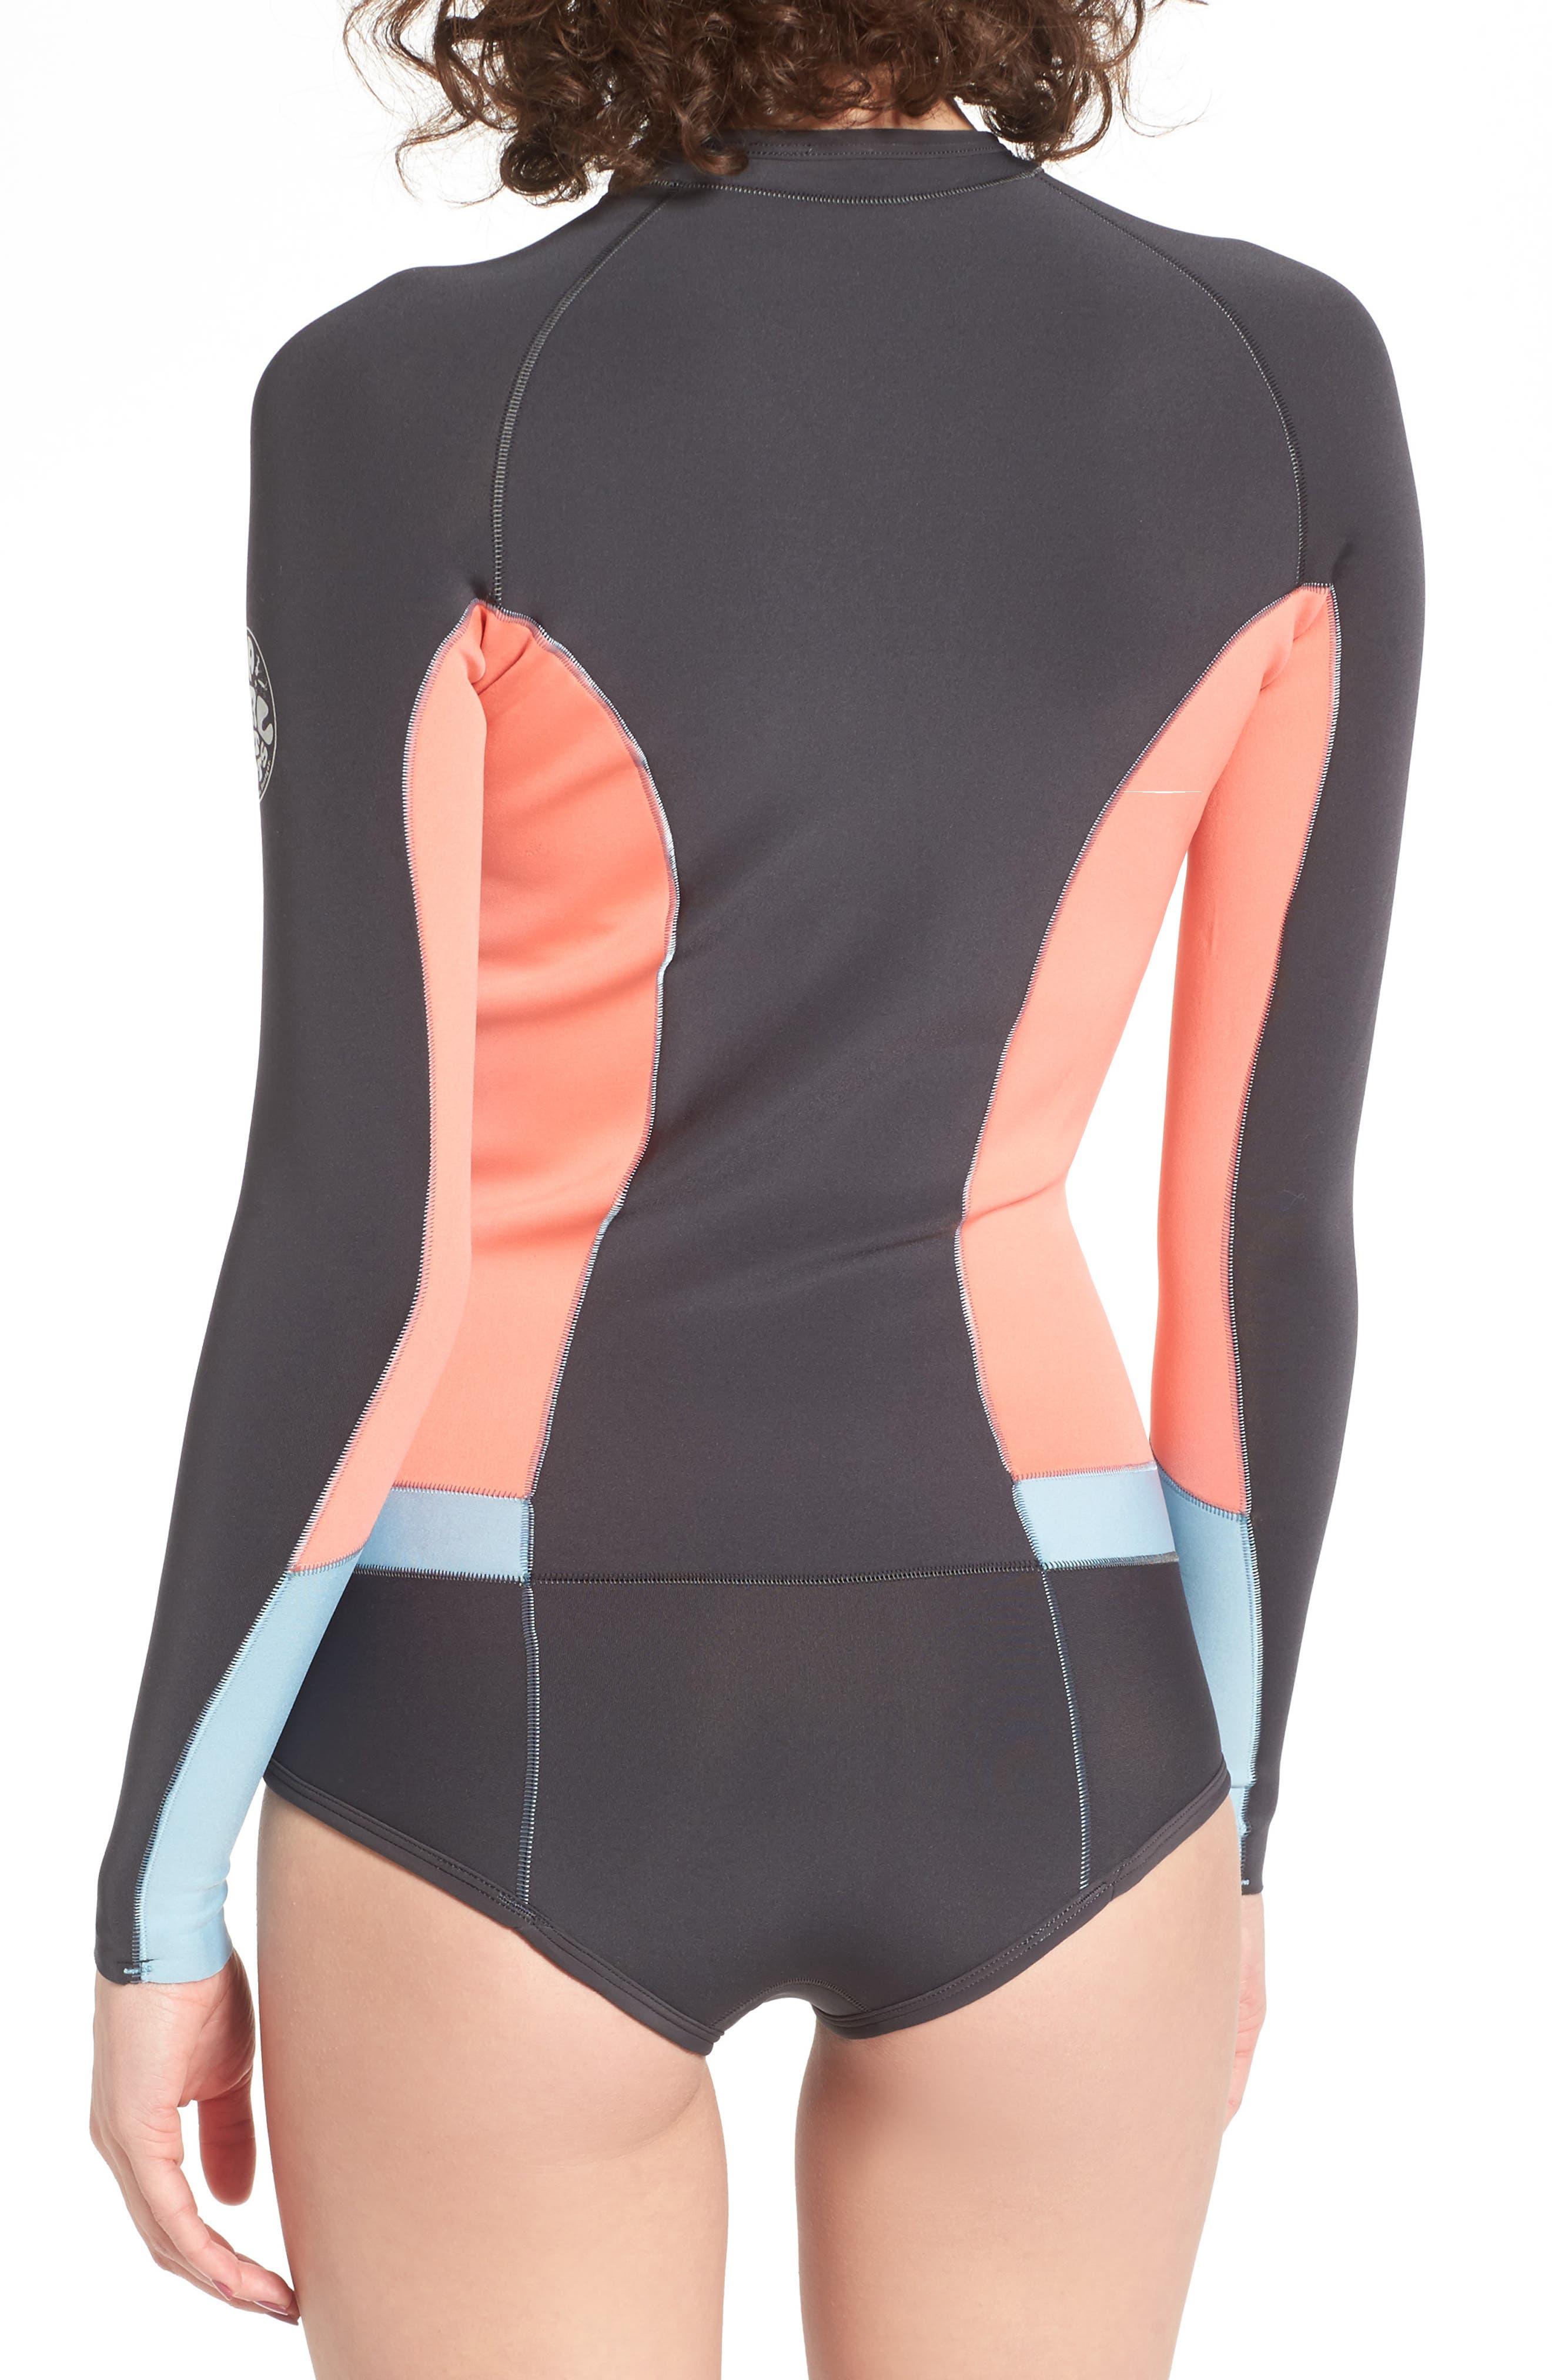 G-Bomb Long Sleeve Wetsuit,                             Alternate thumbnail 4, color,